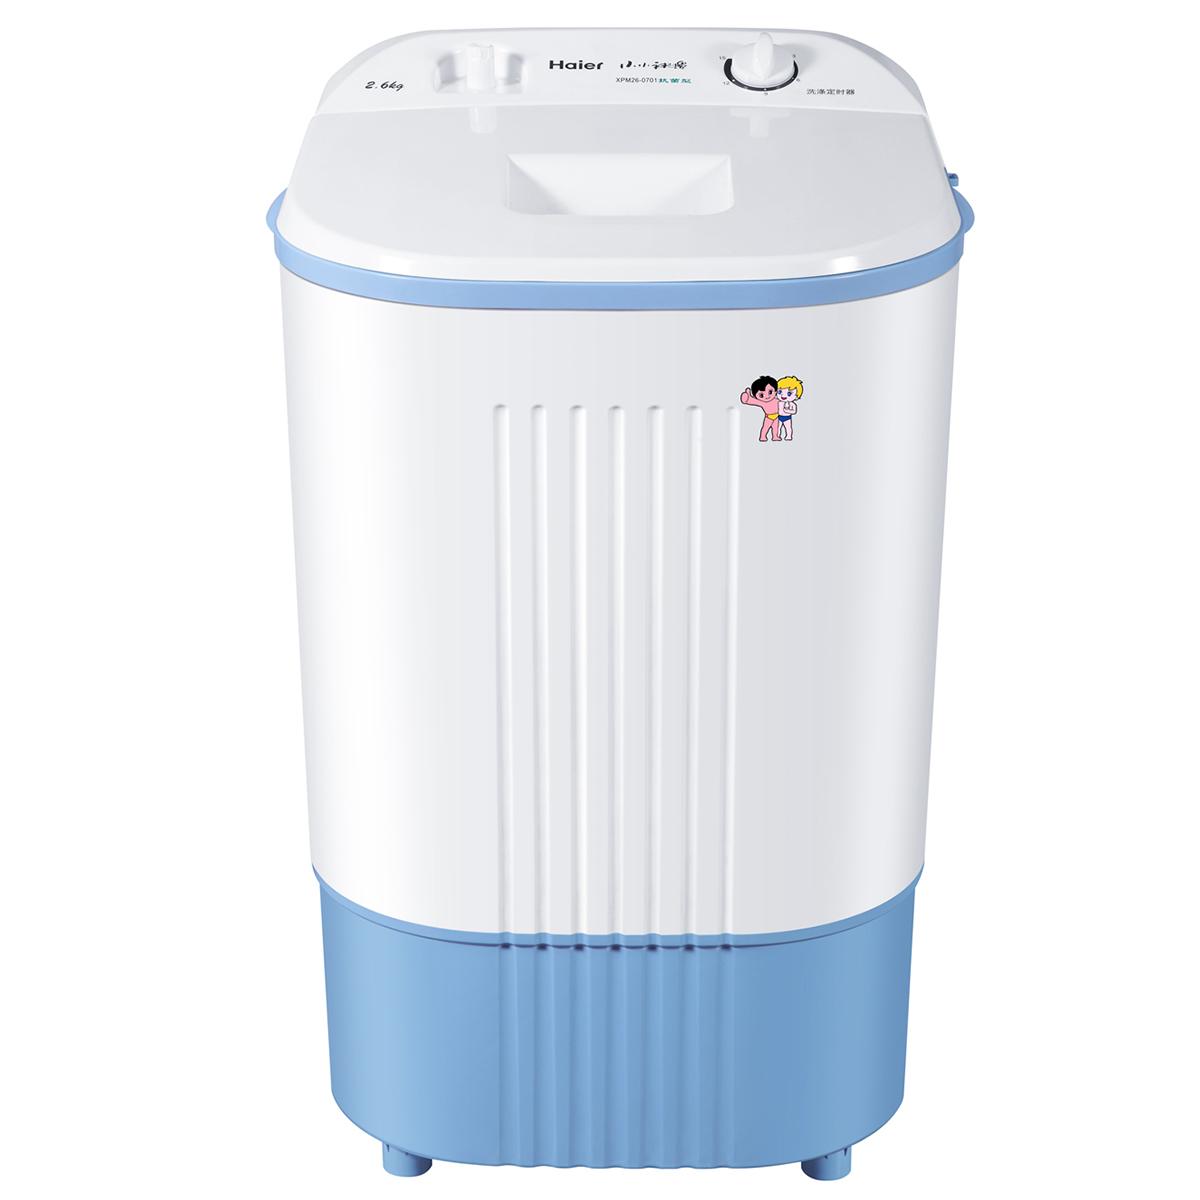 Haier/海尔                         mini洗衣机                         XPM26-0701